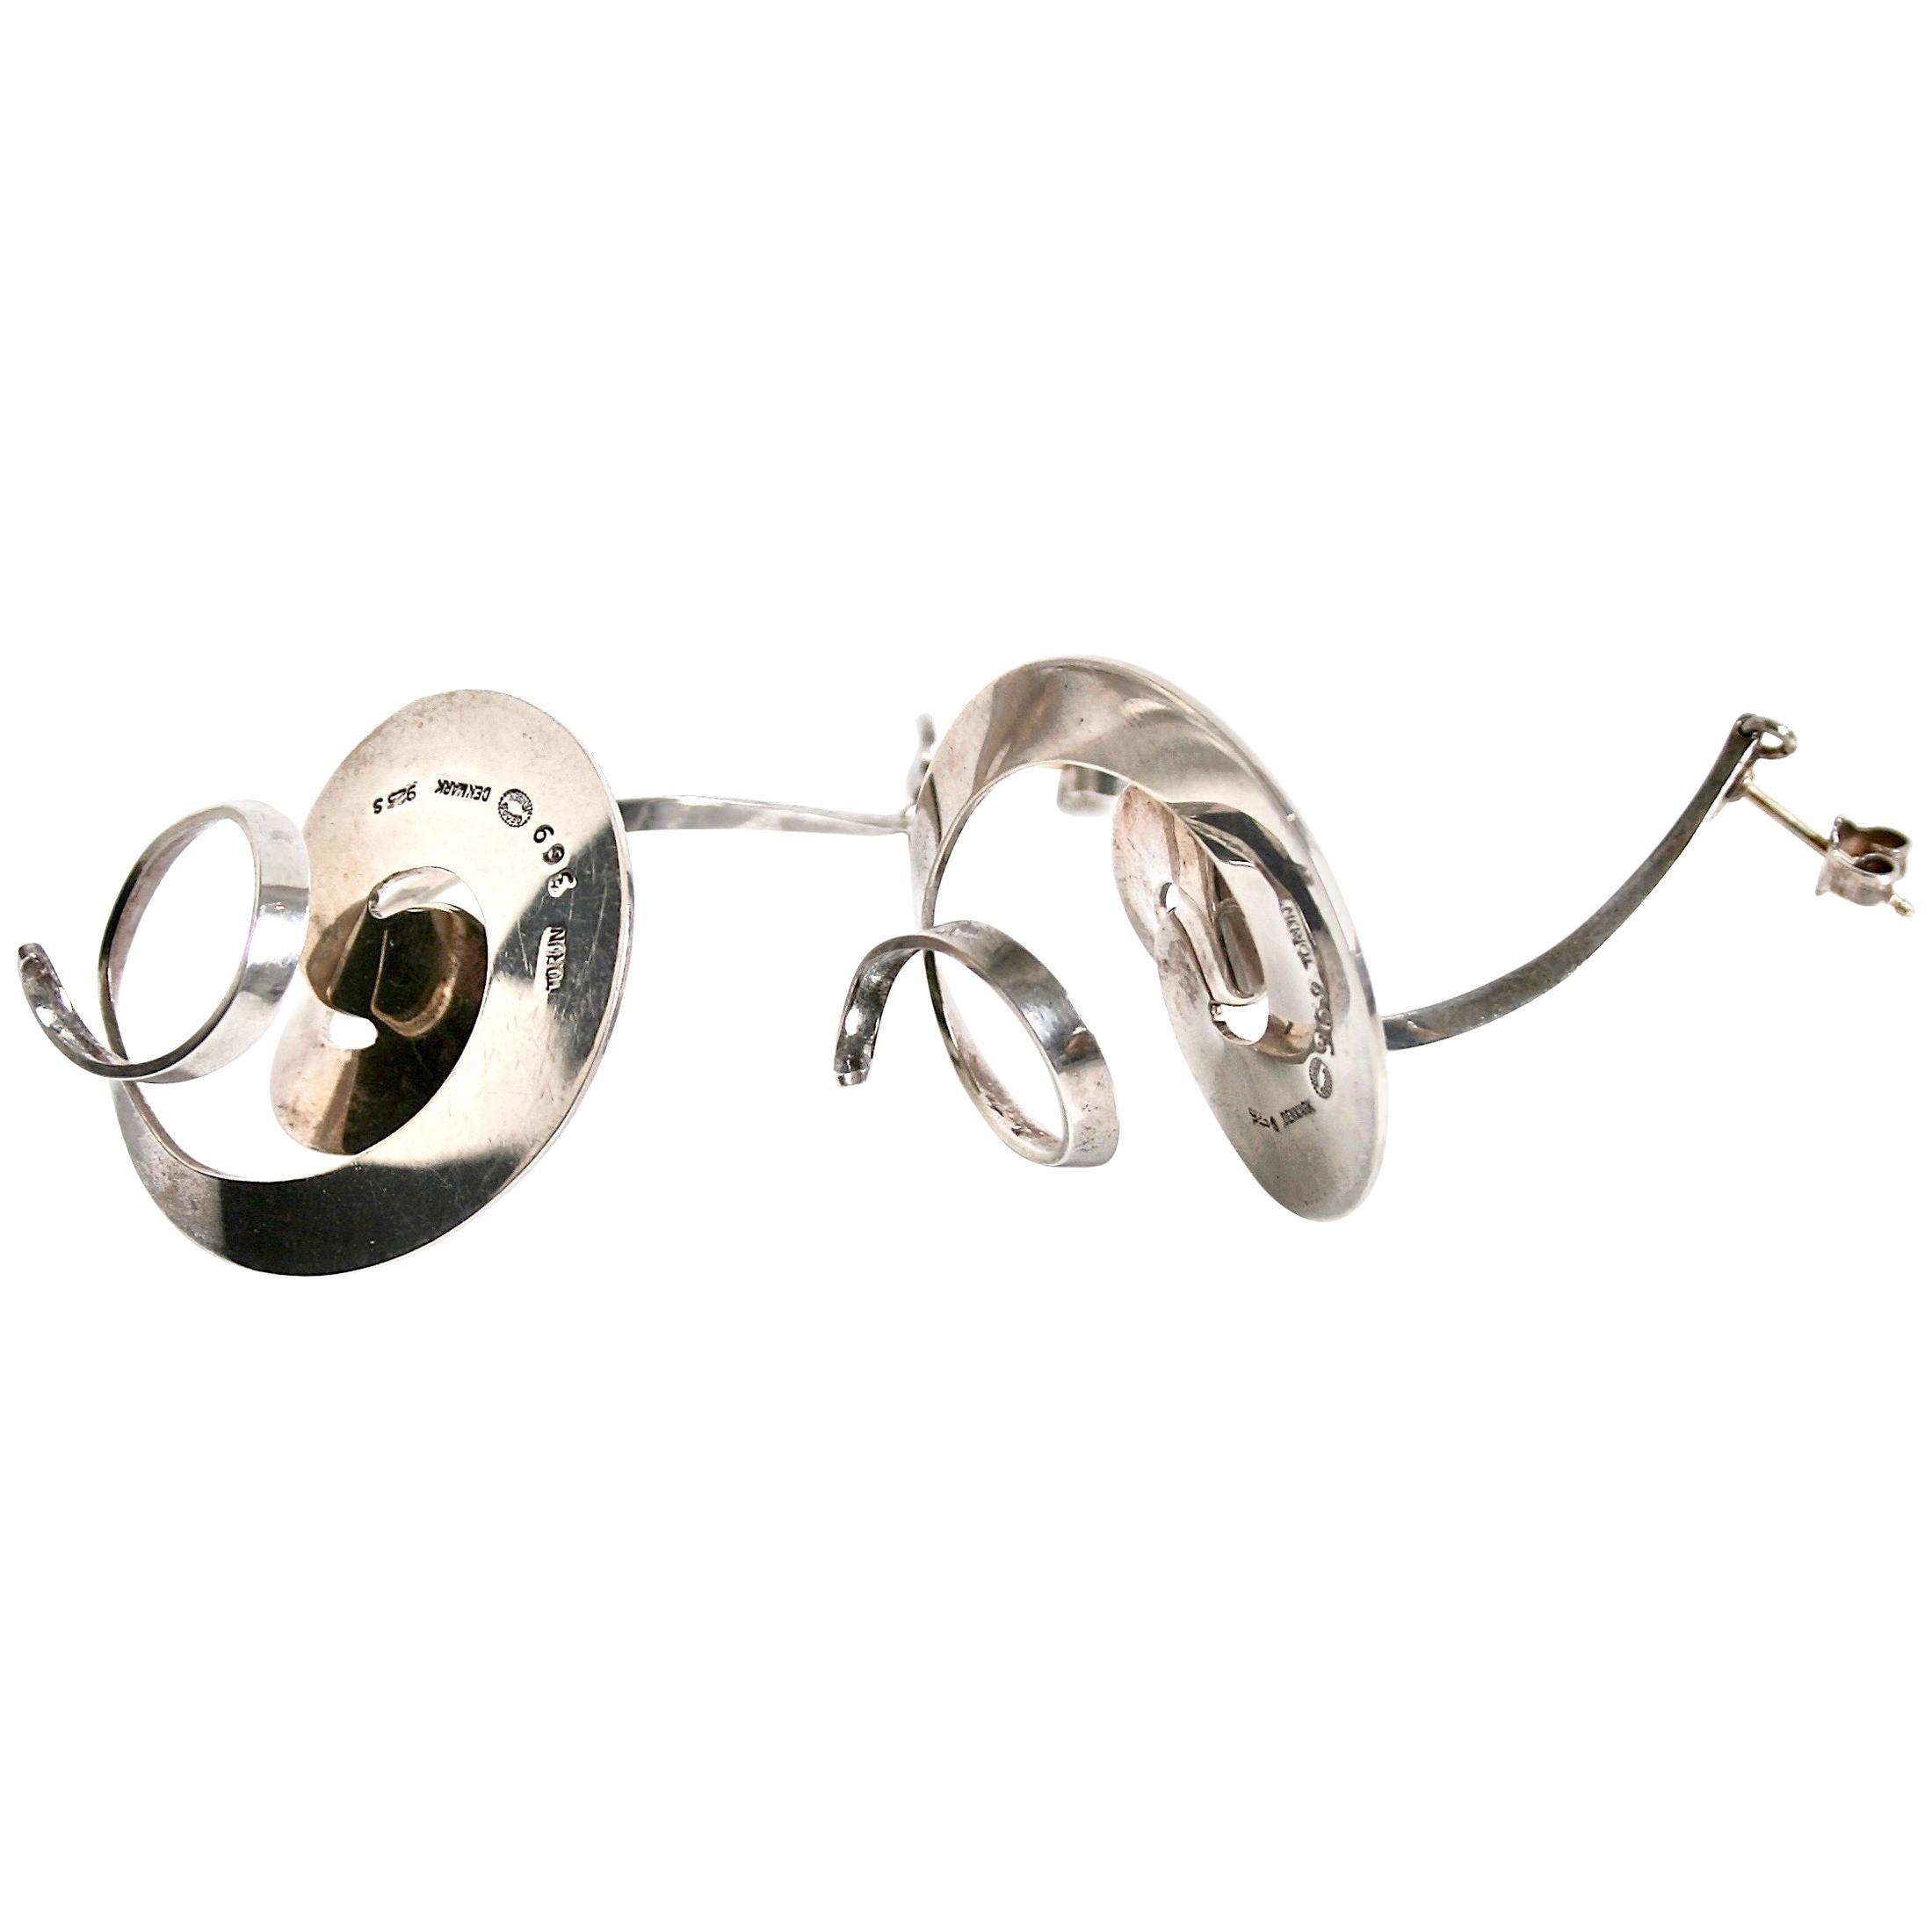 Georg Jensen Swirl Earrings Designed by Vivianna Torun Bulow-Hübe, Denmark